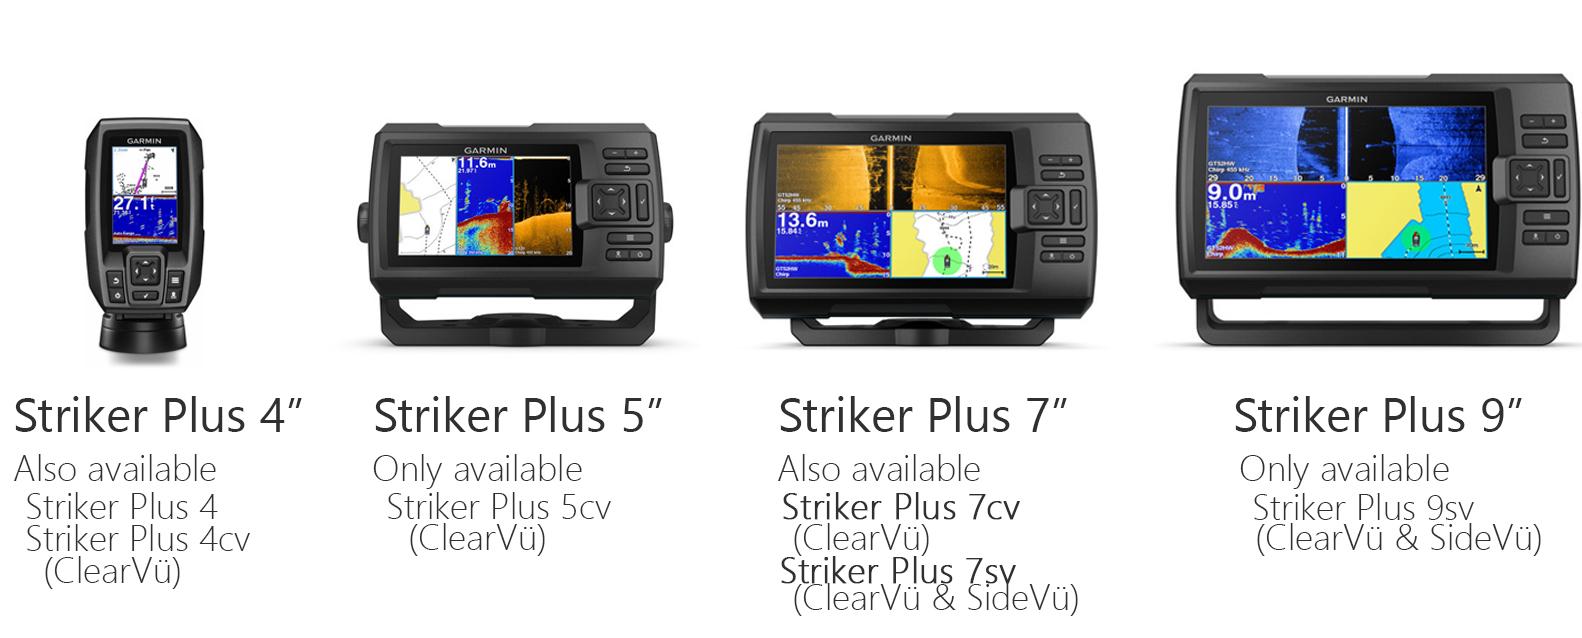 Striker Plus Series all available Australian models